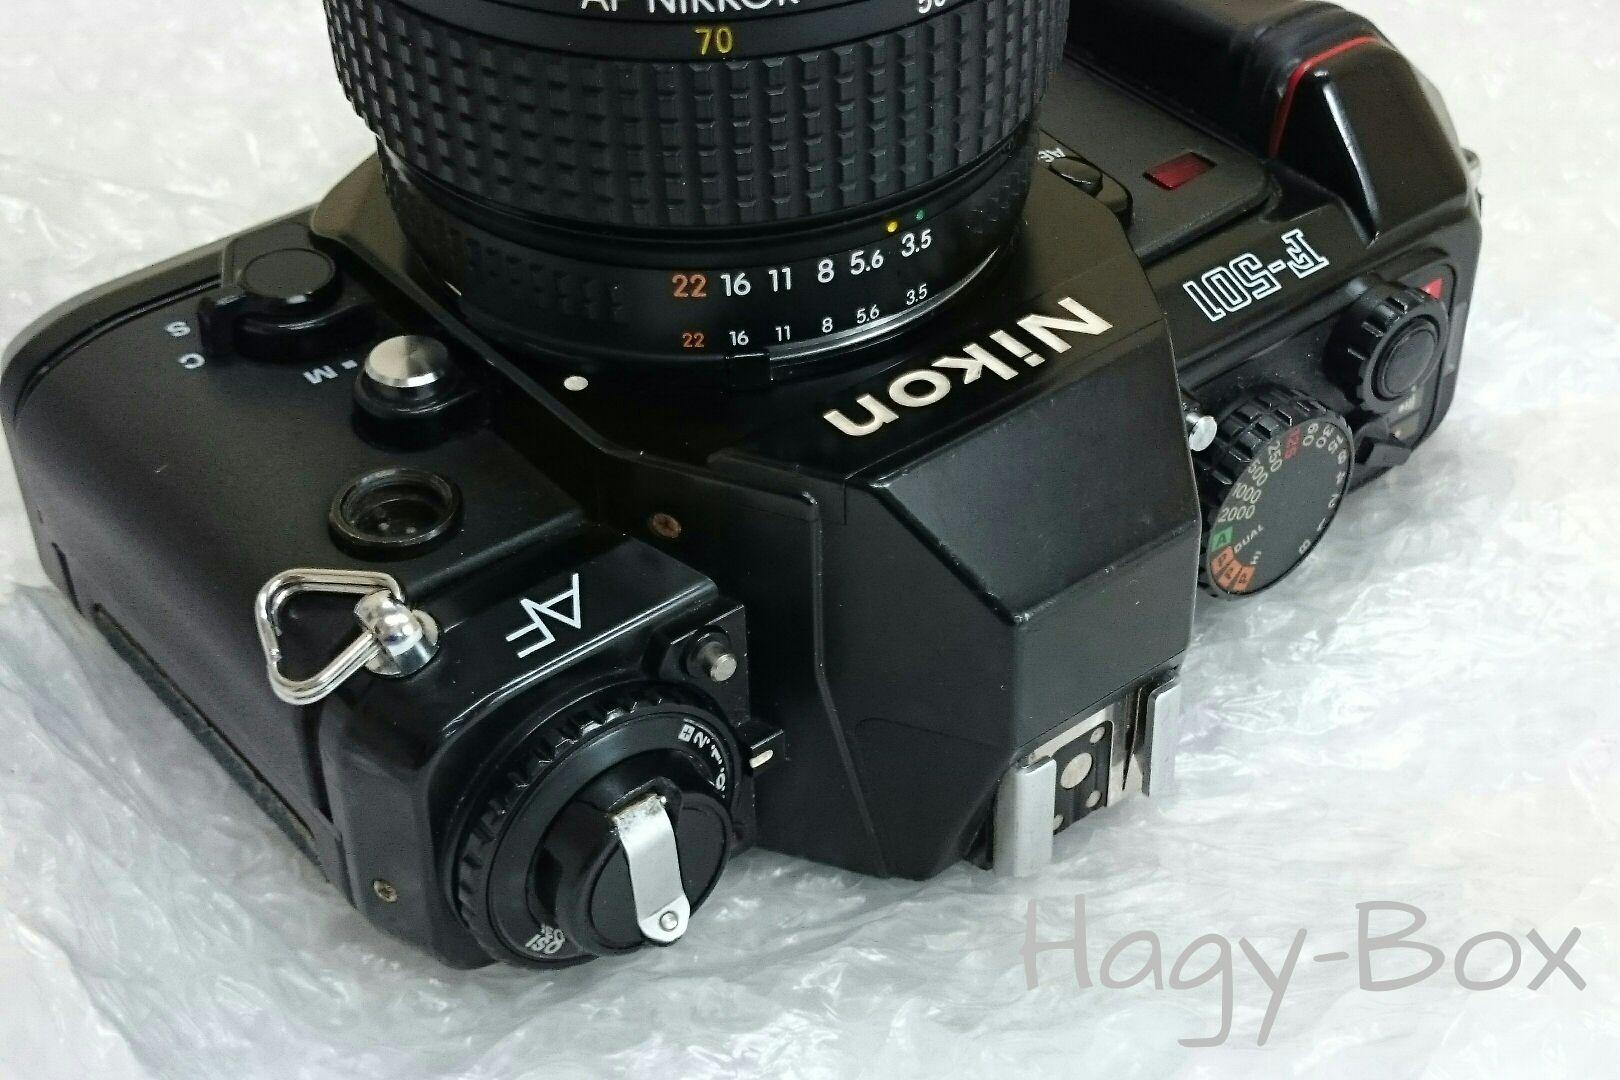 Nikon F-501AF 様をお迎えしました。その1 / Nikon F-501AF